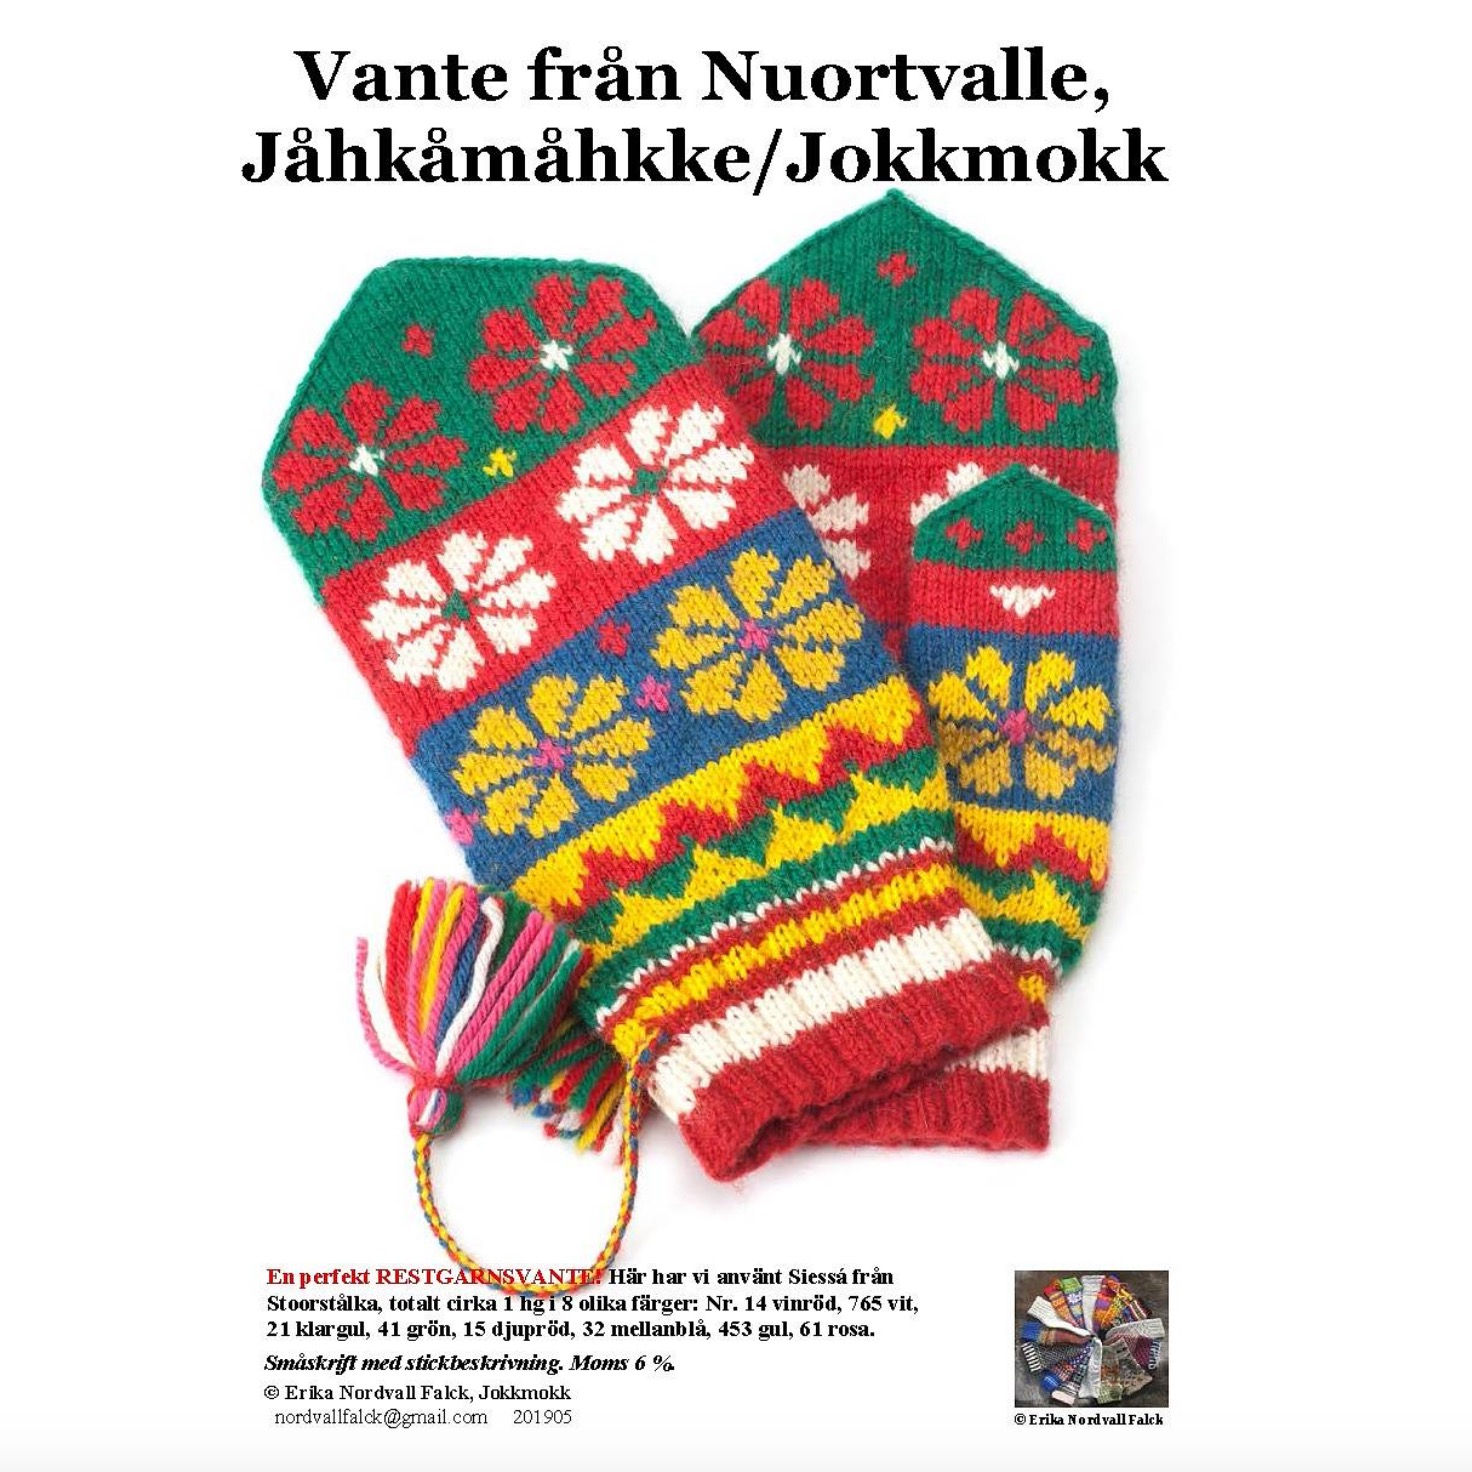 Nuortvalle, Jokkmokk vante, Stoorstålka